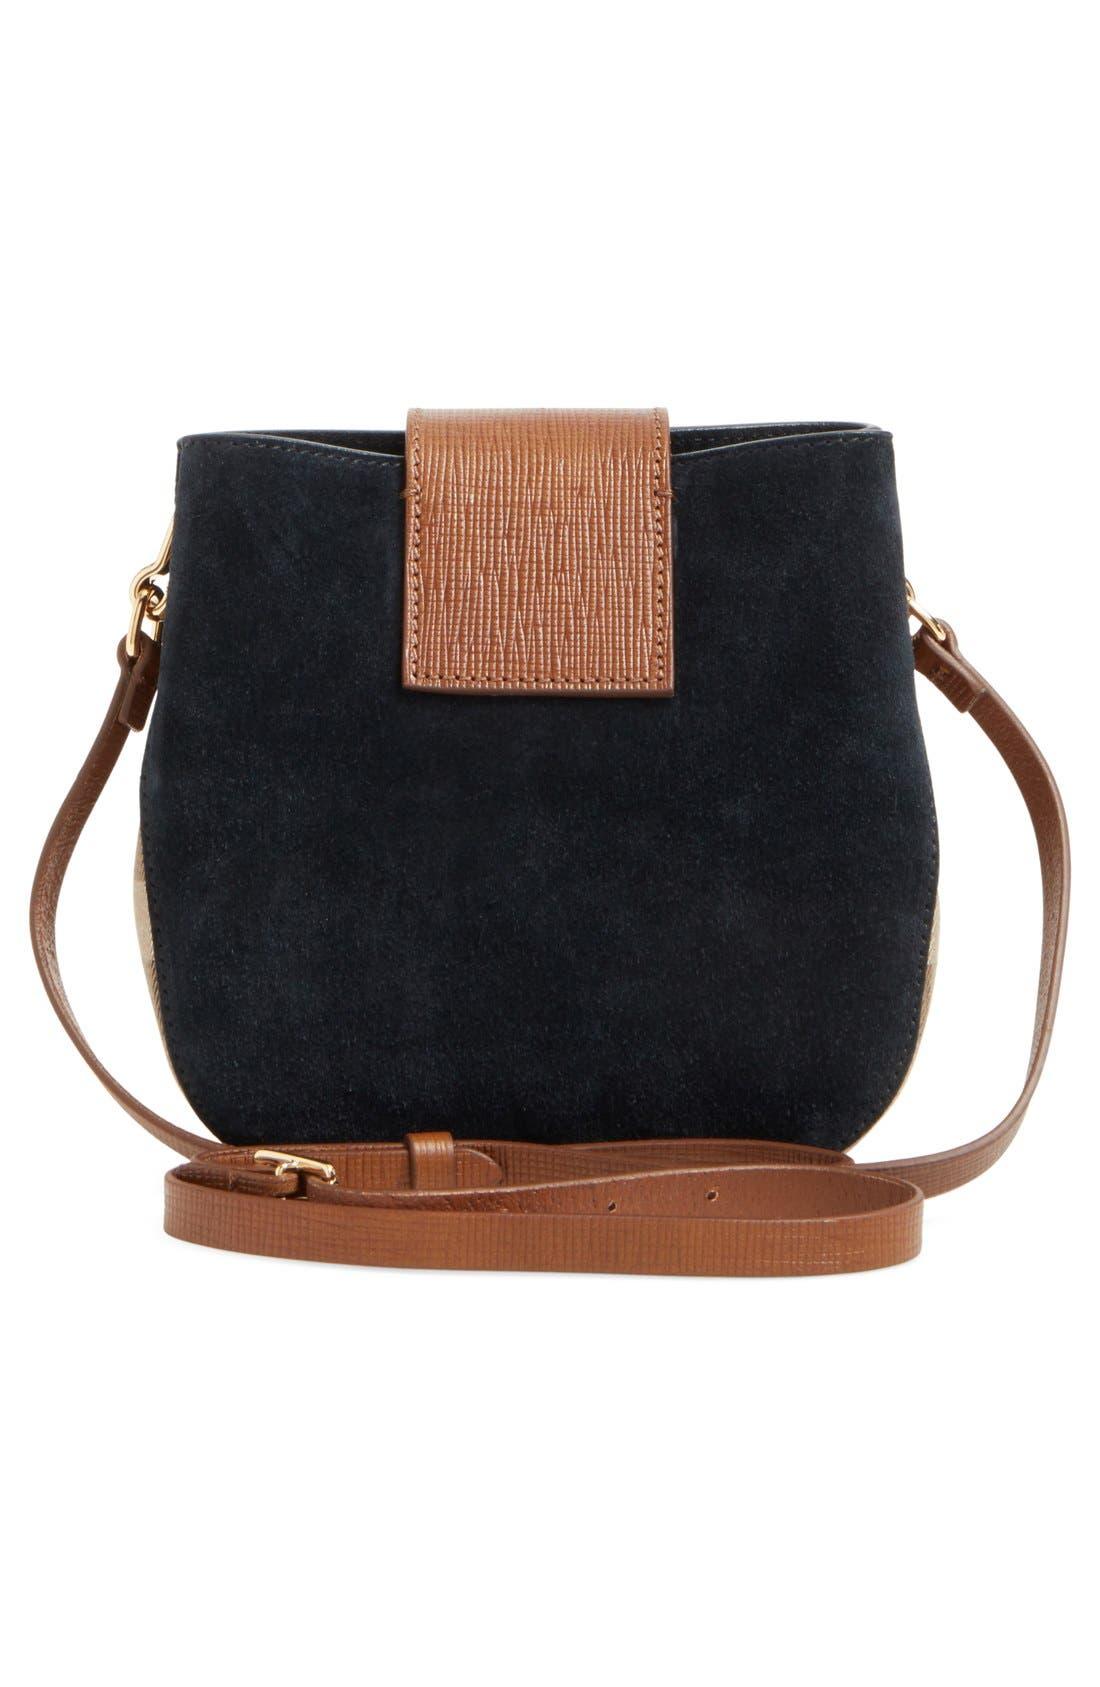 Alternate Image 3  - Burberry Suede & Canvas Convertible Crossbody Bag